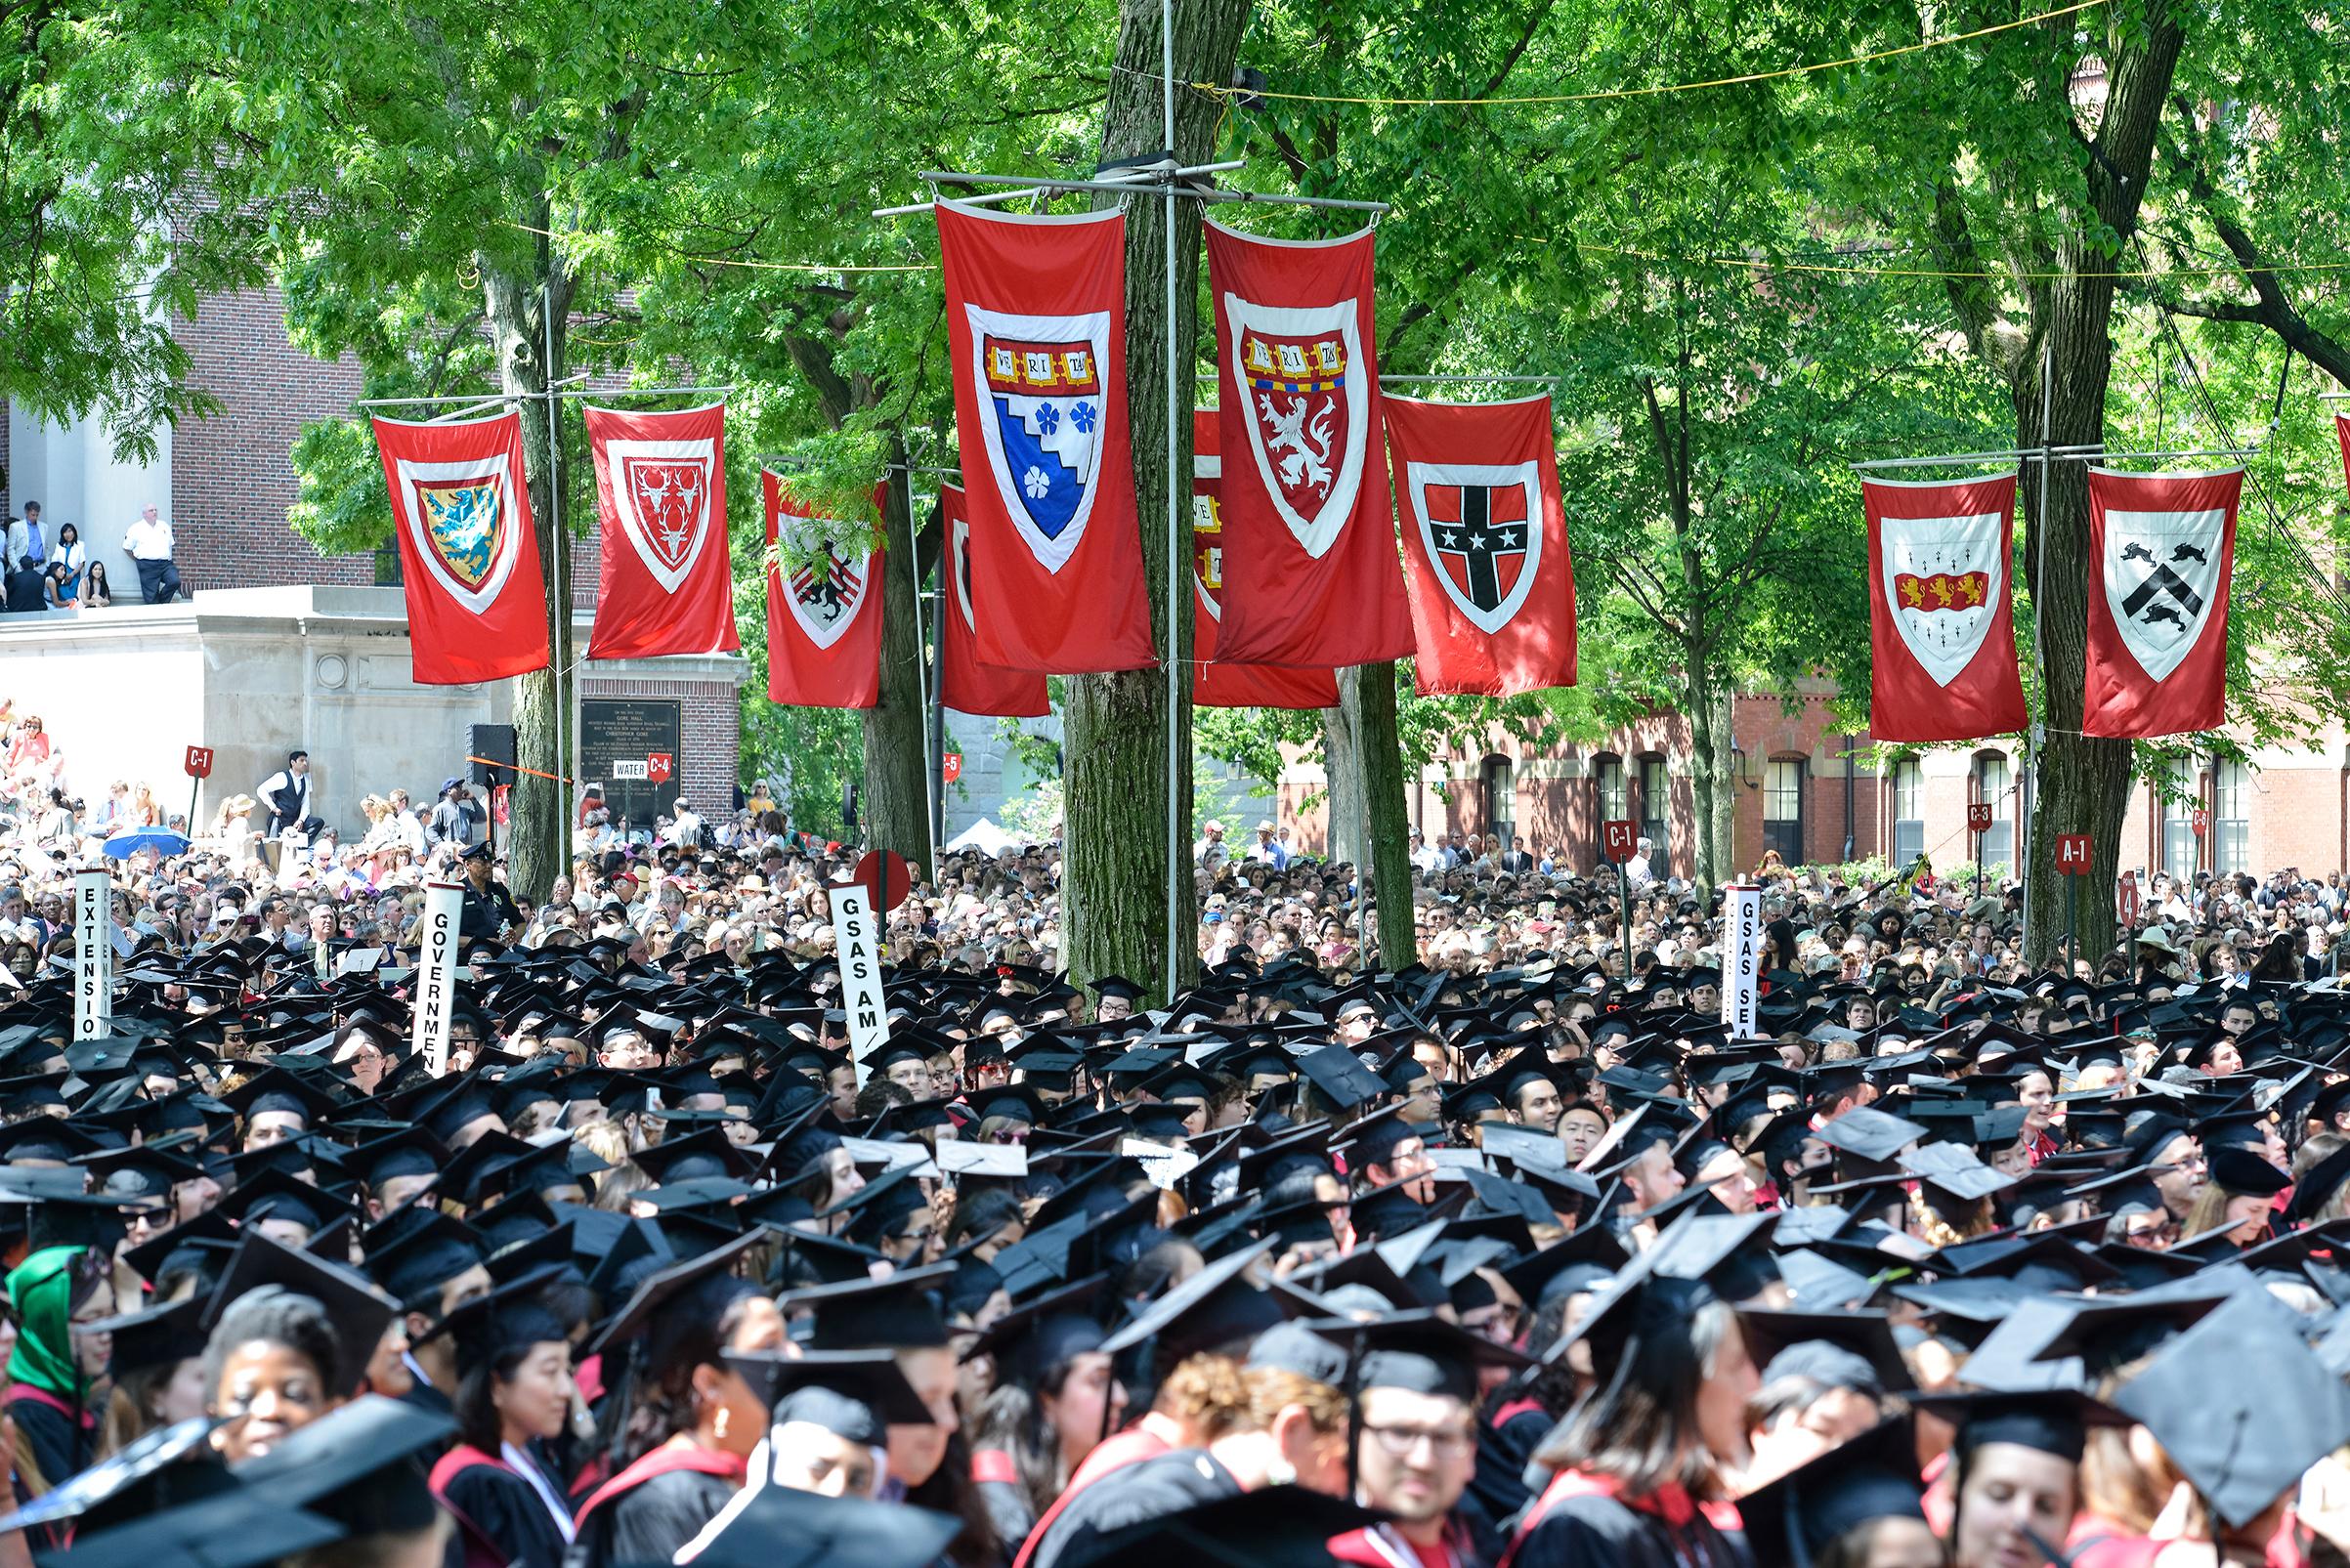 Harvard Commencement held in Harvard Yard in Cambridge, Mass., May 30, 2013.